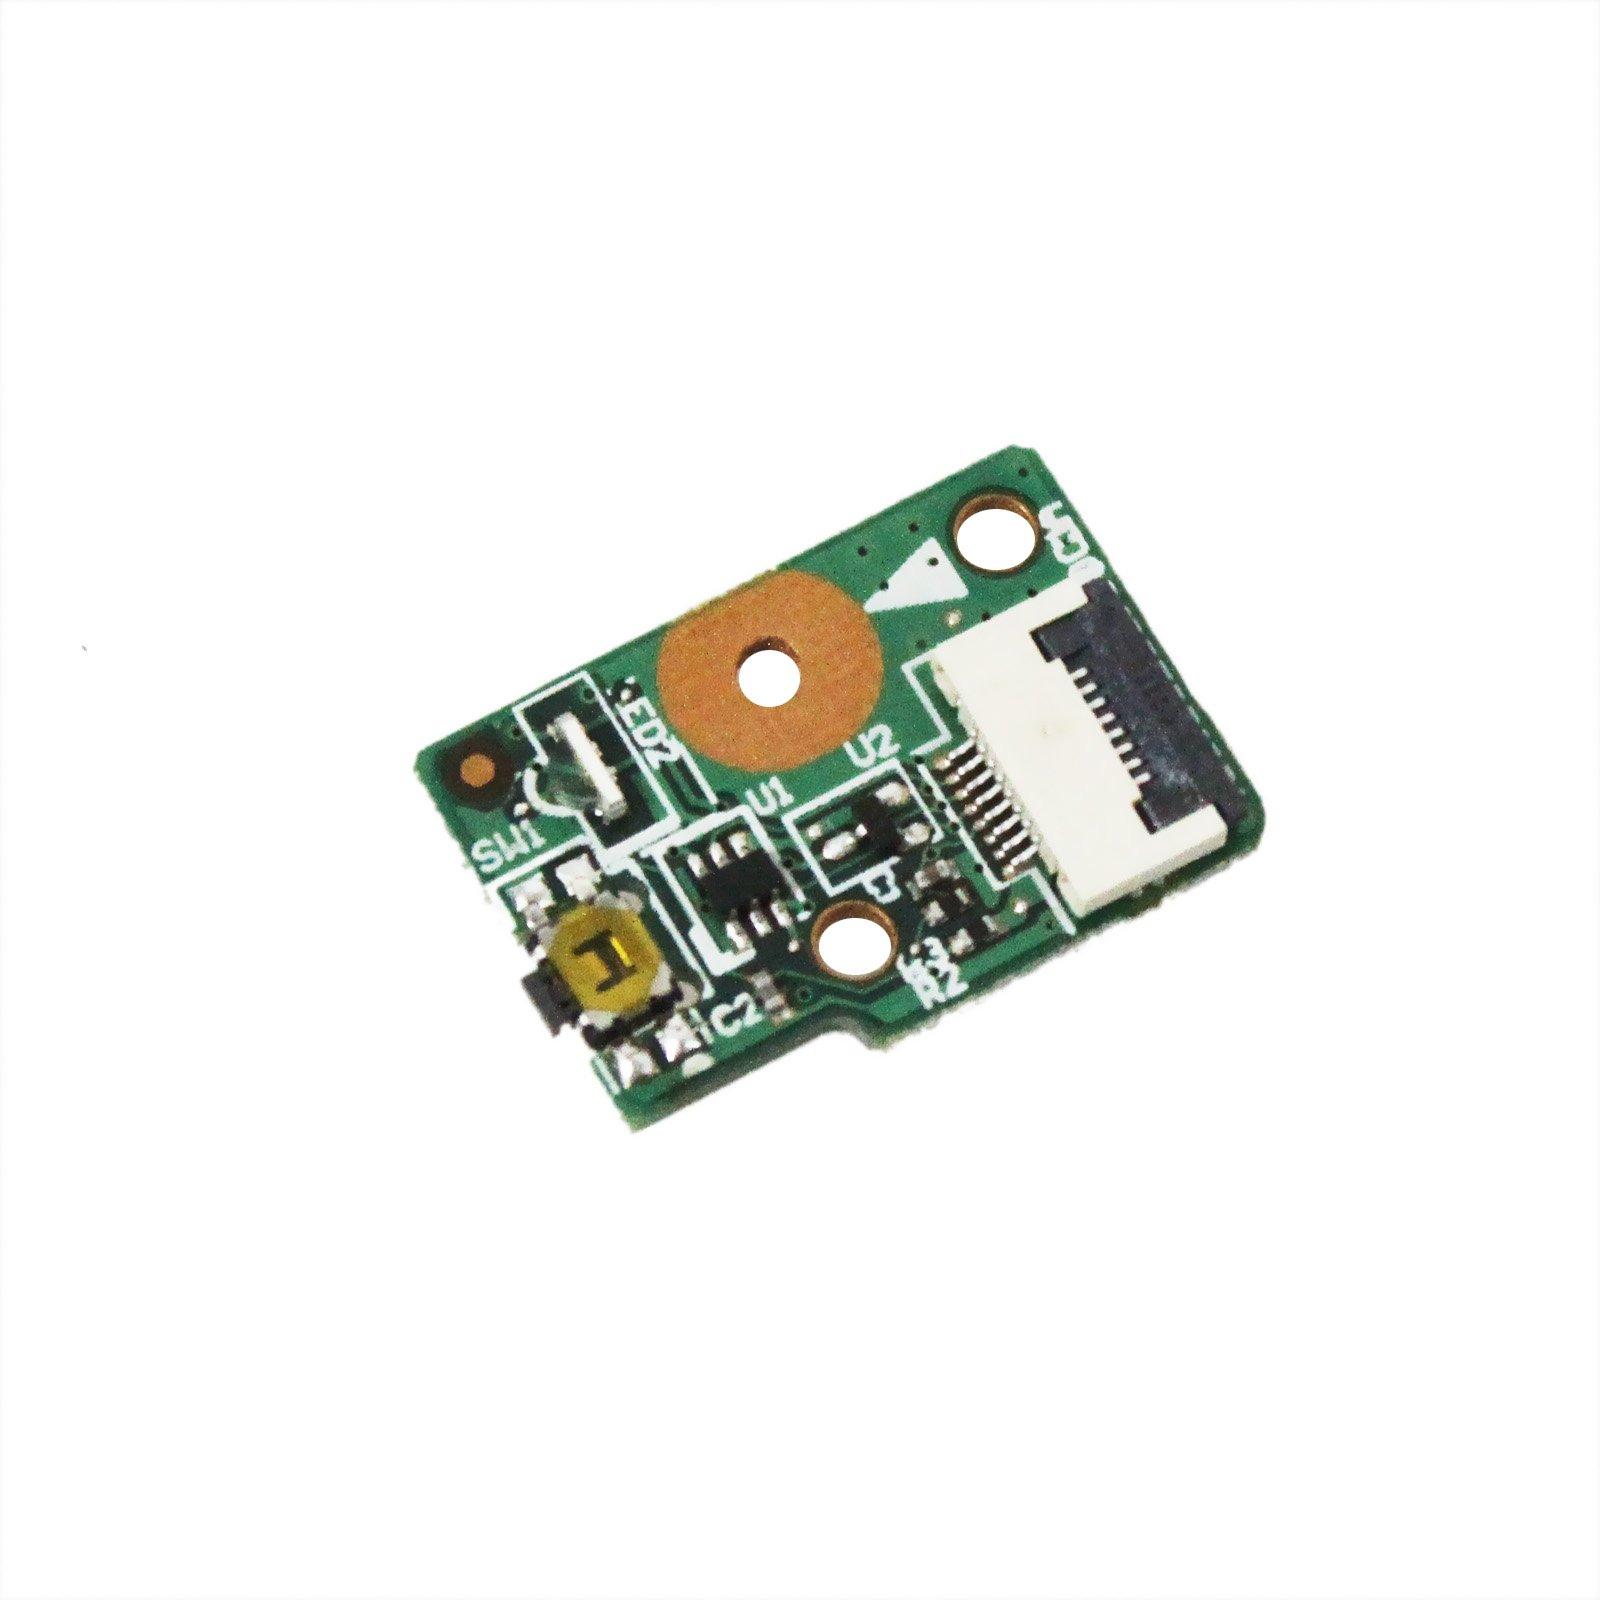 Boton encendido para Lenovo Flex 20404 2-14 2-14D 5C50F78739